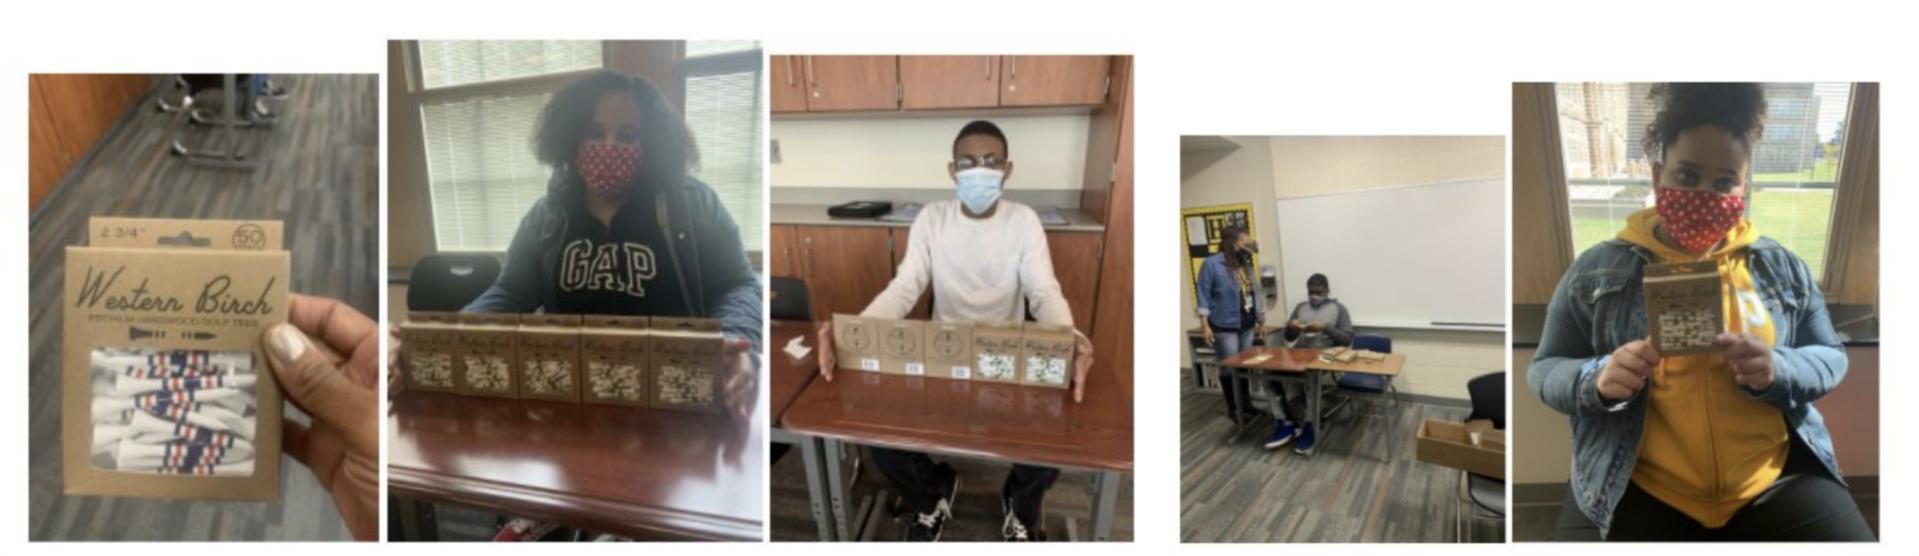 Student Work Experience Photos